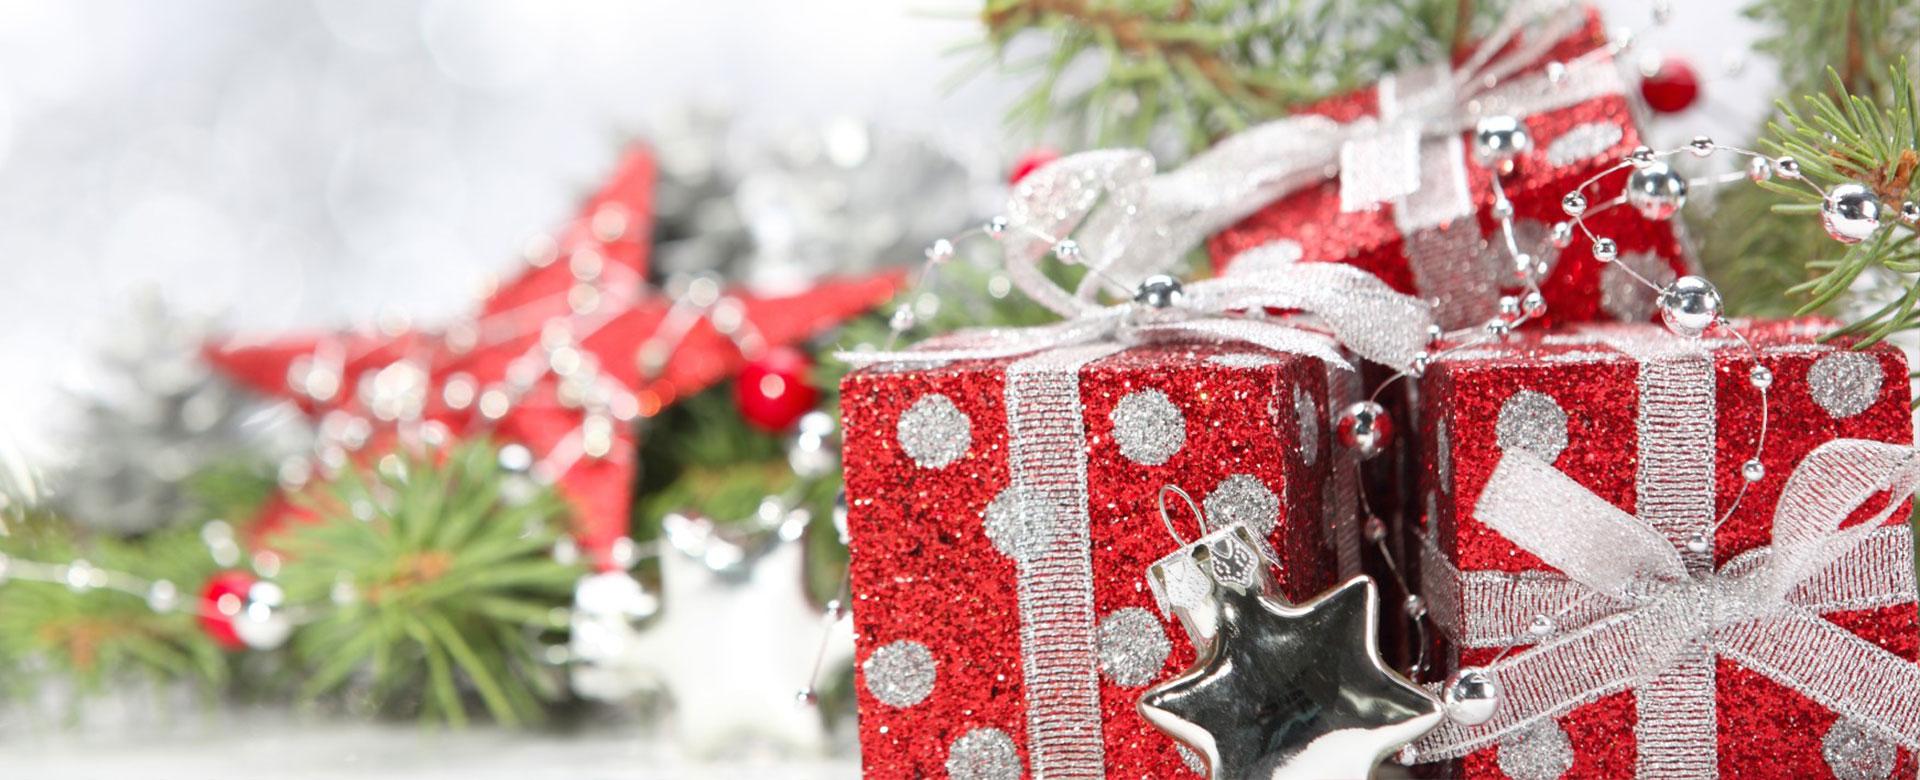 natale-regali2